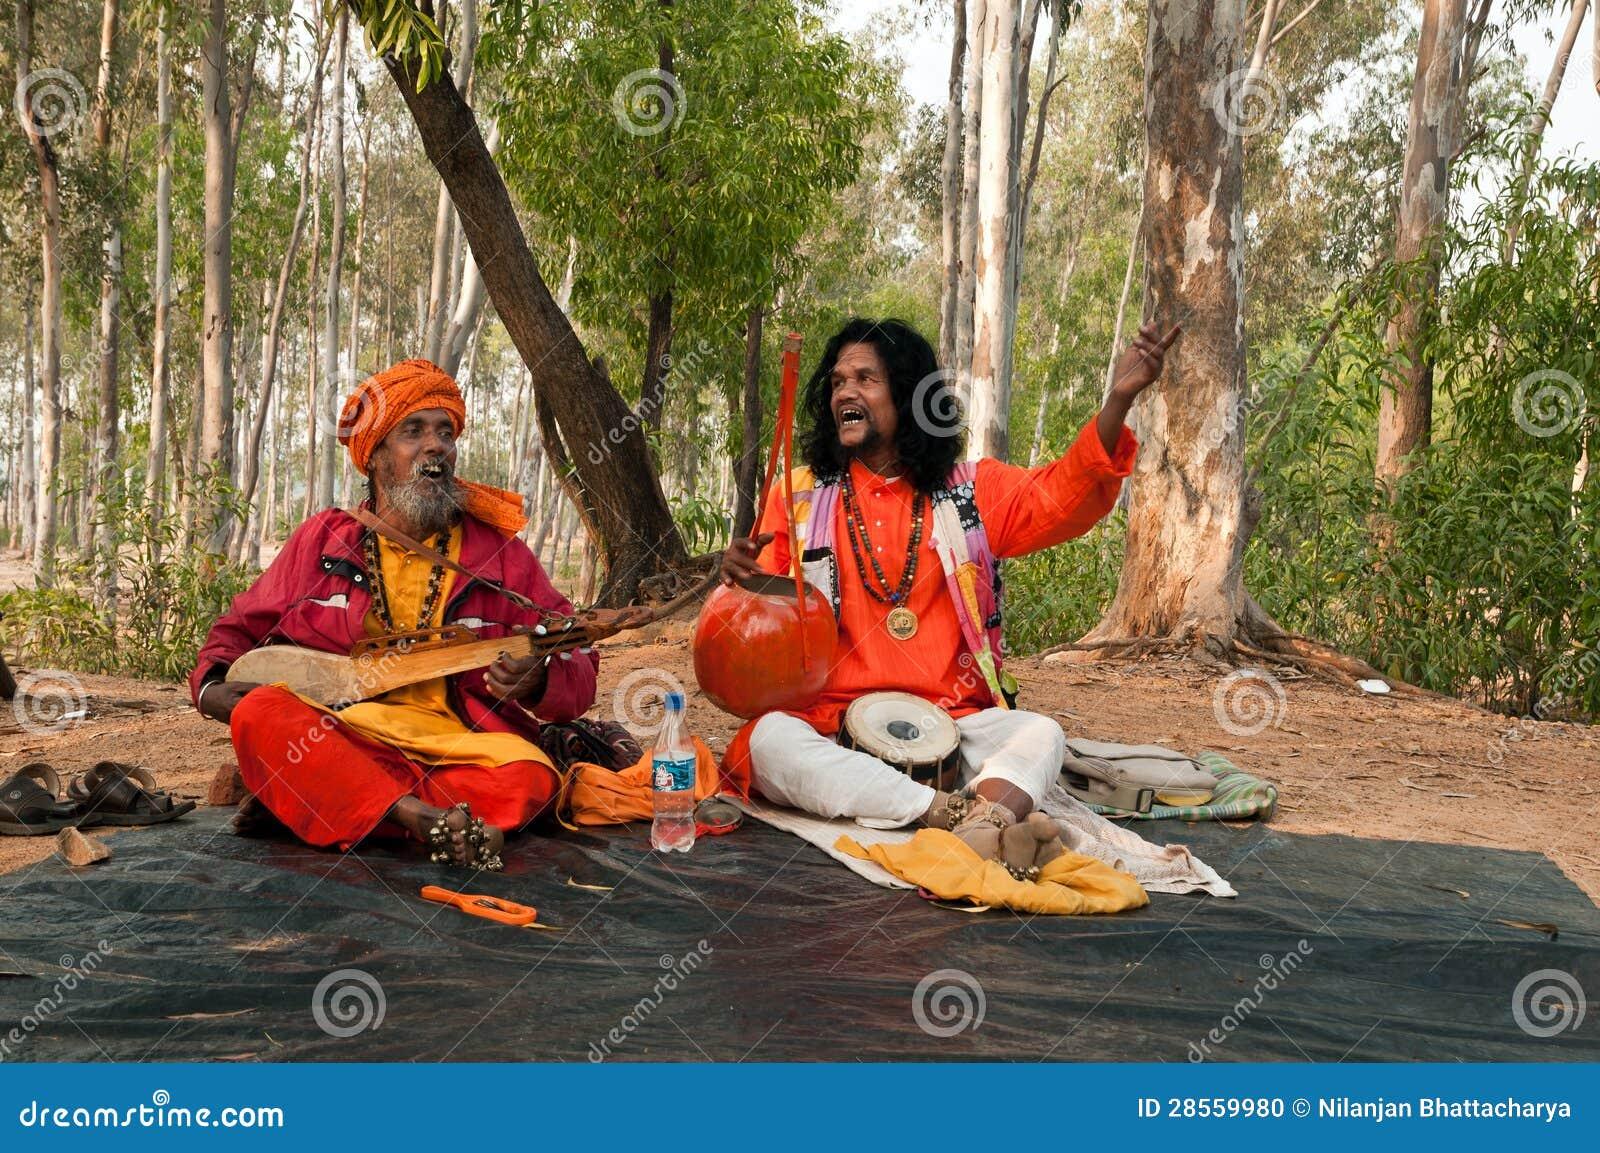 Indian baul folk singers